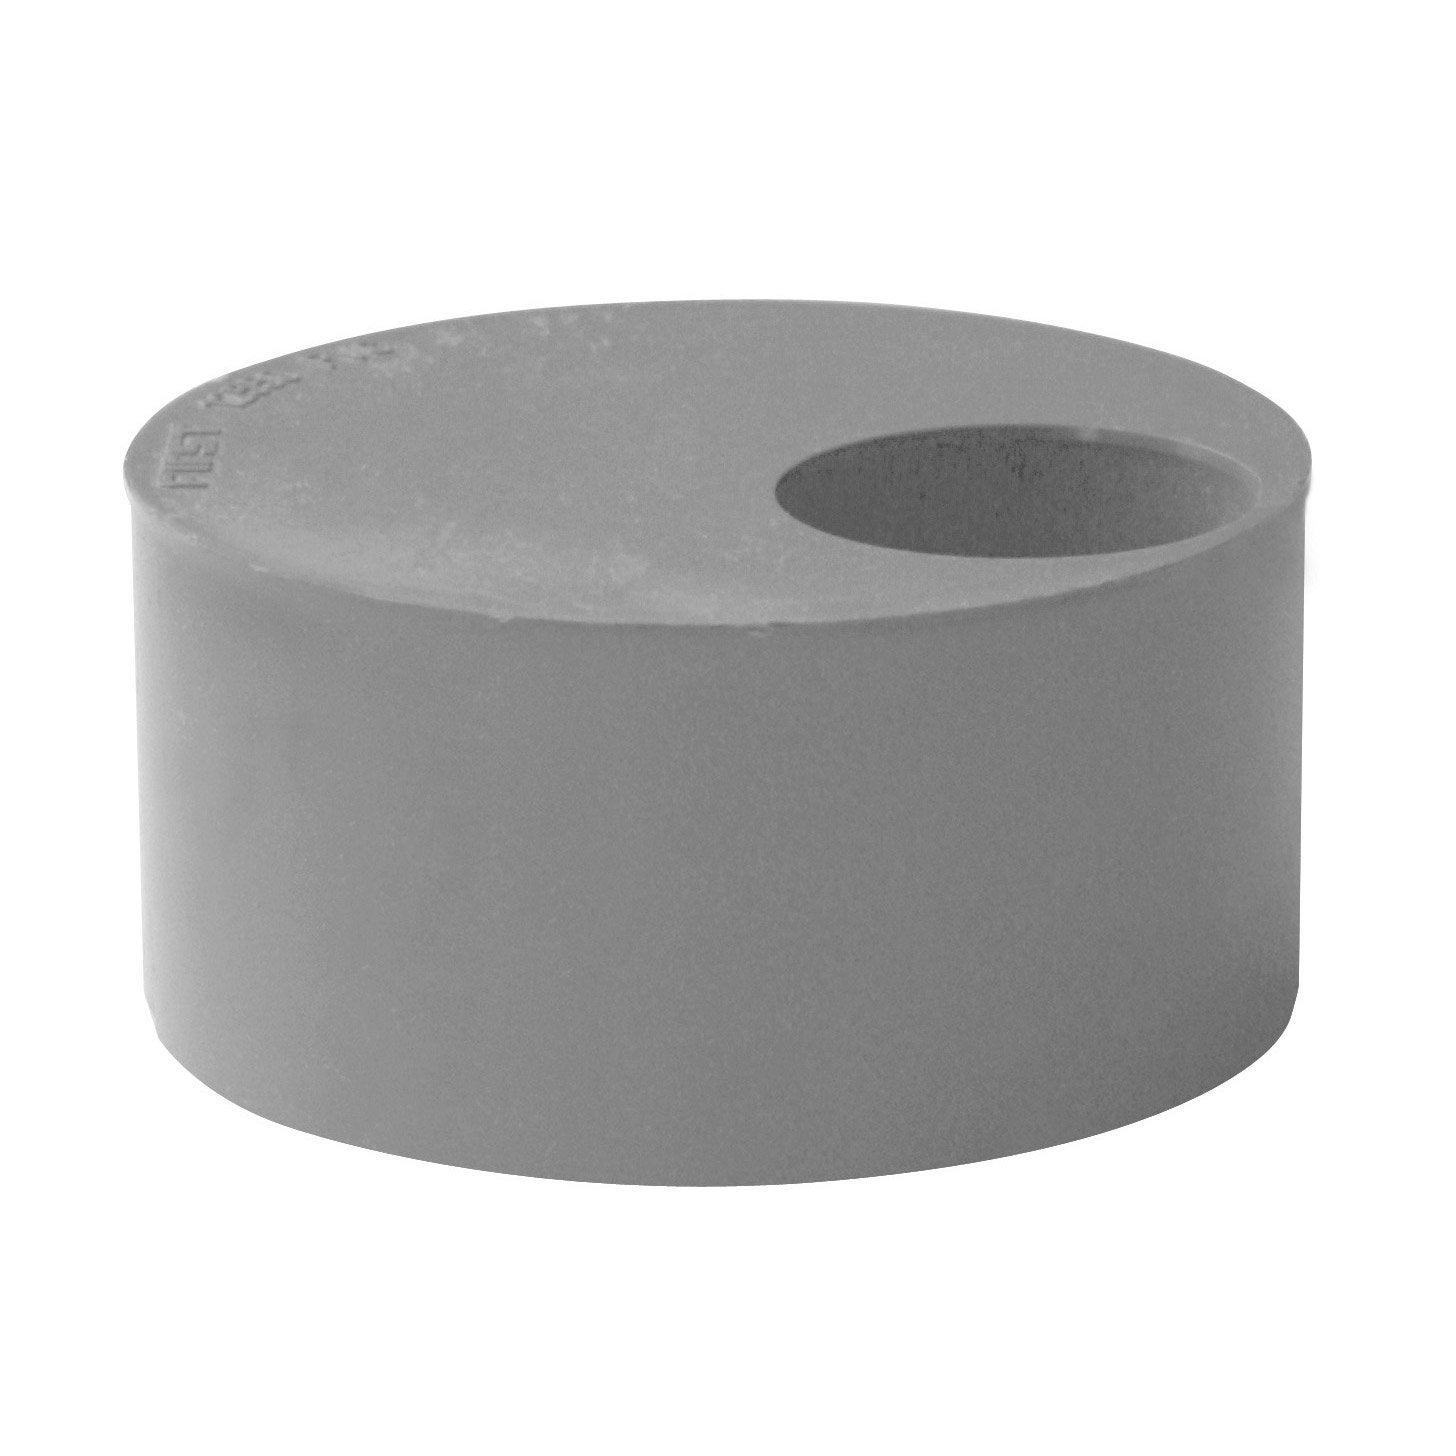 tampon de r duction simple pvc mm first plast. Black Bedroom Furniture Sets. Home Design Ideas